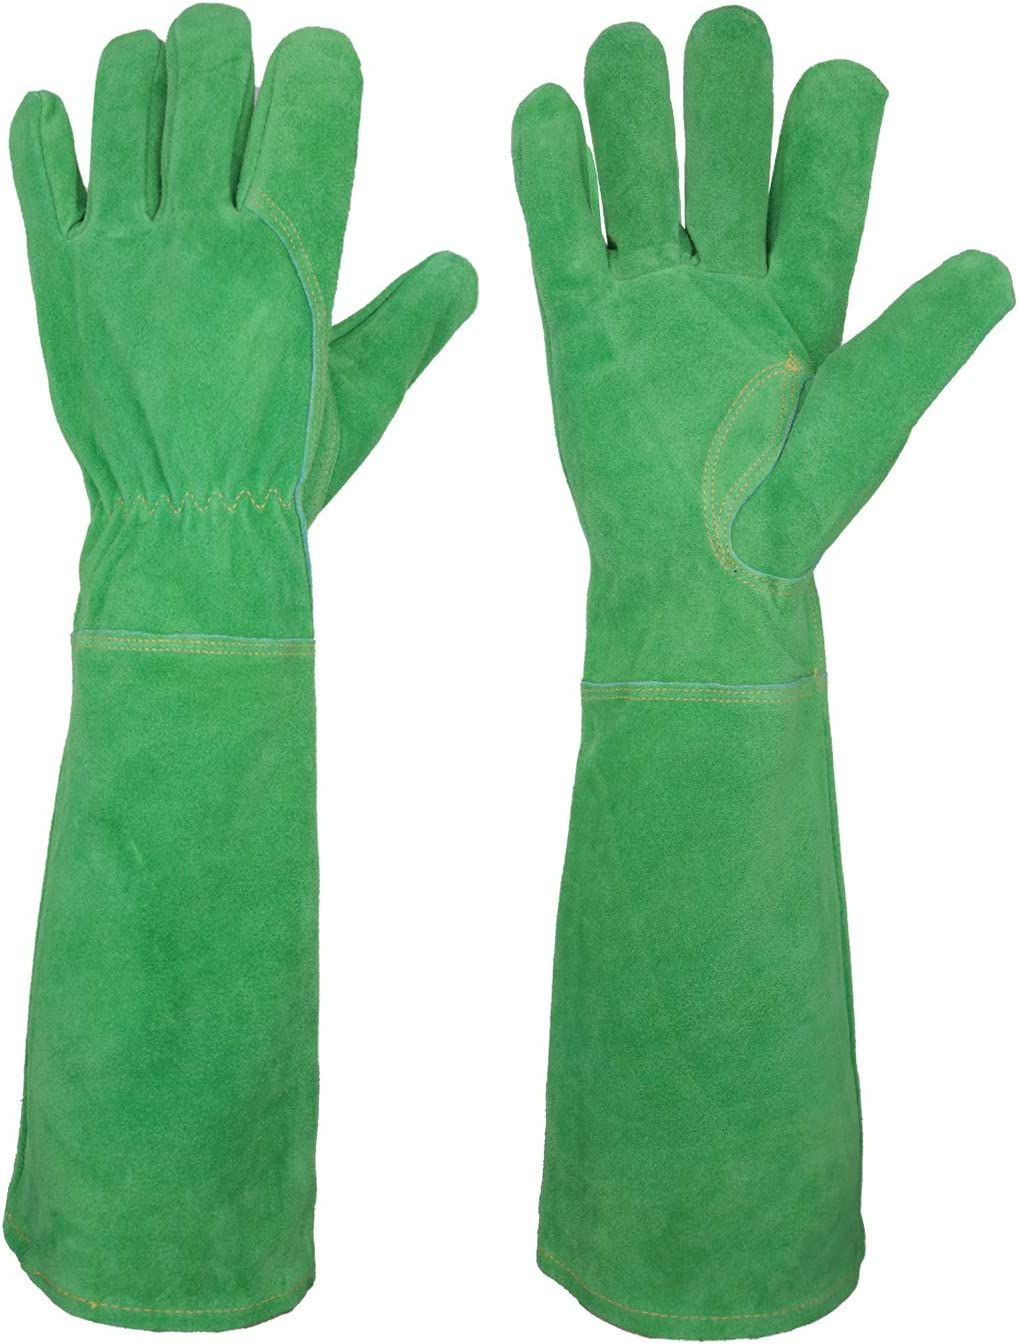 Rose Pruning Gloves for Women Long Sleeve Thorn Proof Cowhide Leather Gardening Gloves Gauntlet Garden Gloves (Medium, Green)